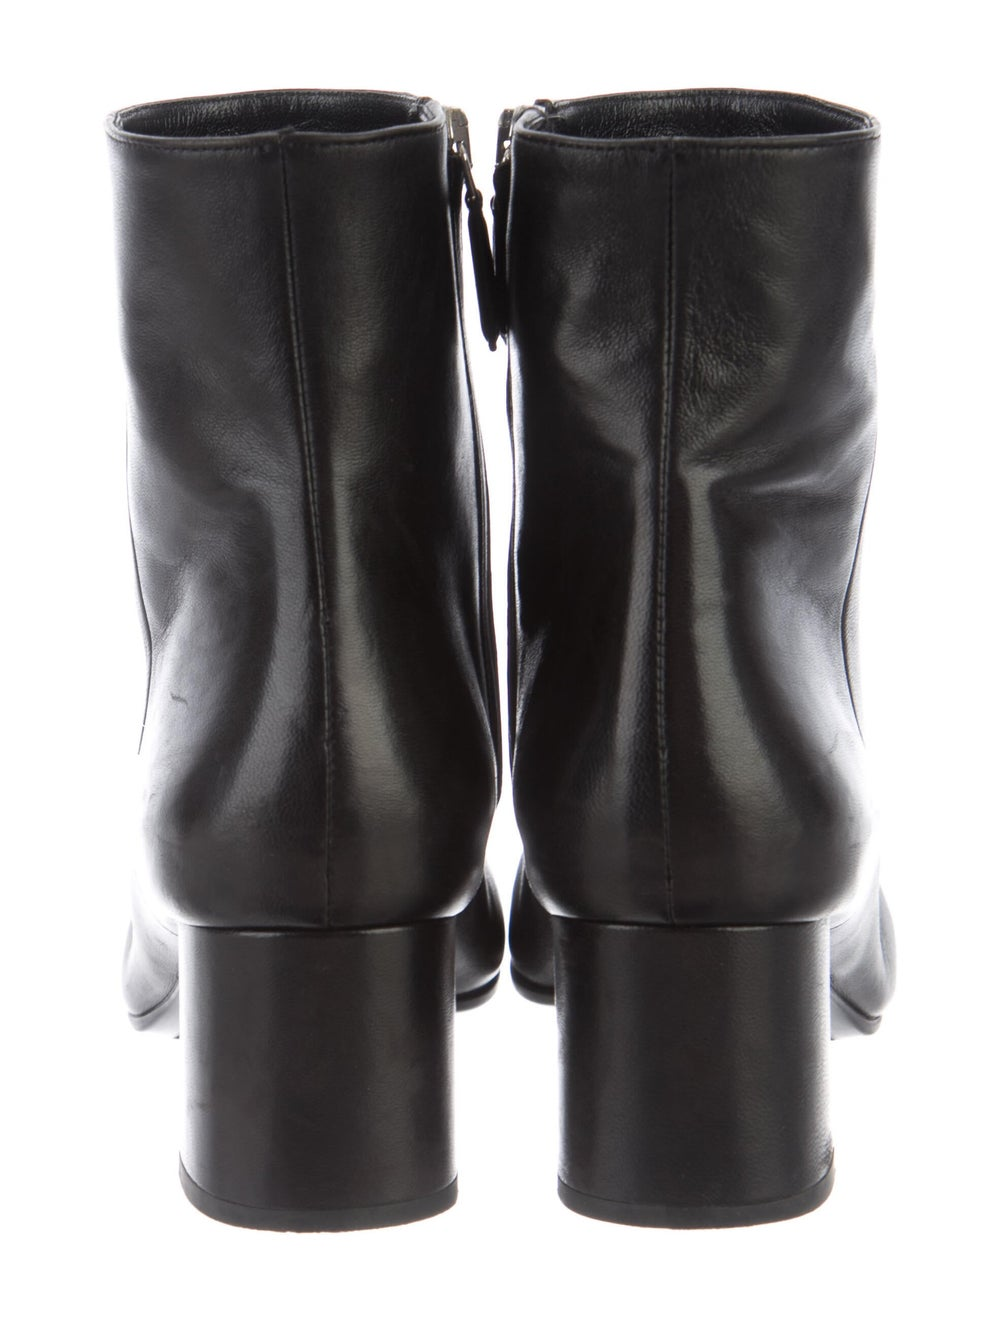 Prada Leather Boots Black - image 4